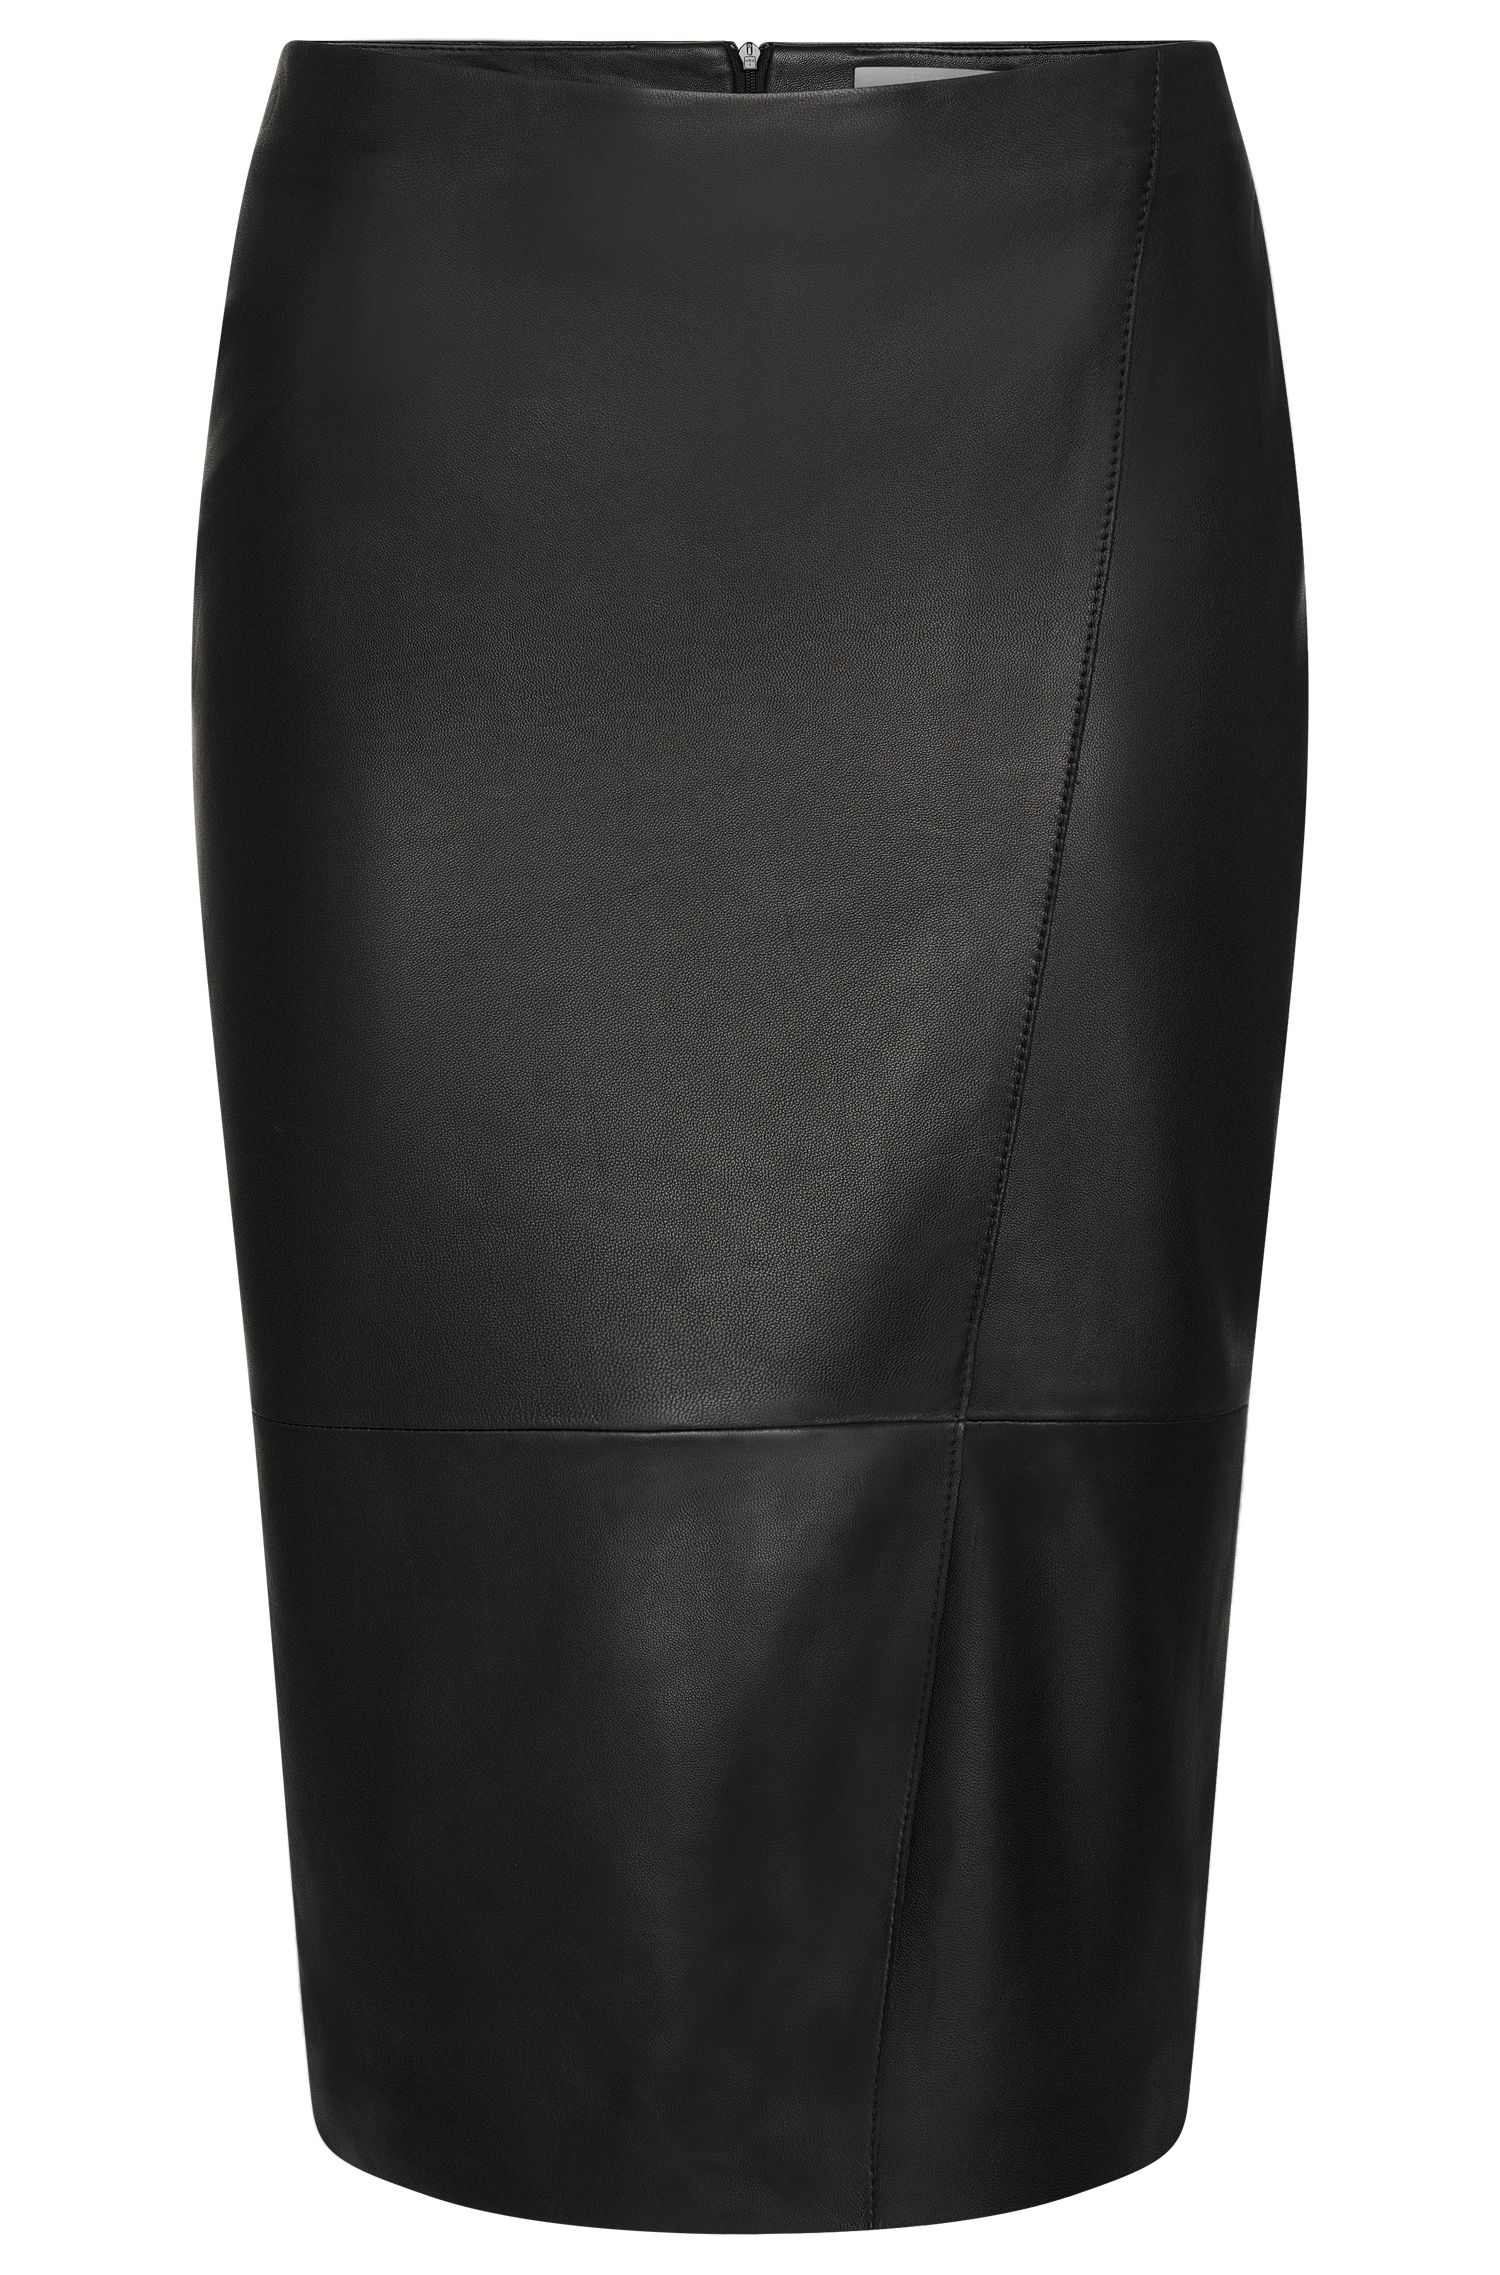 Lambskin Asymmetrical Pencil Skirt | Seylise